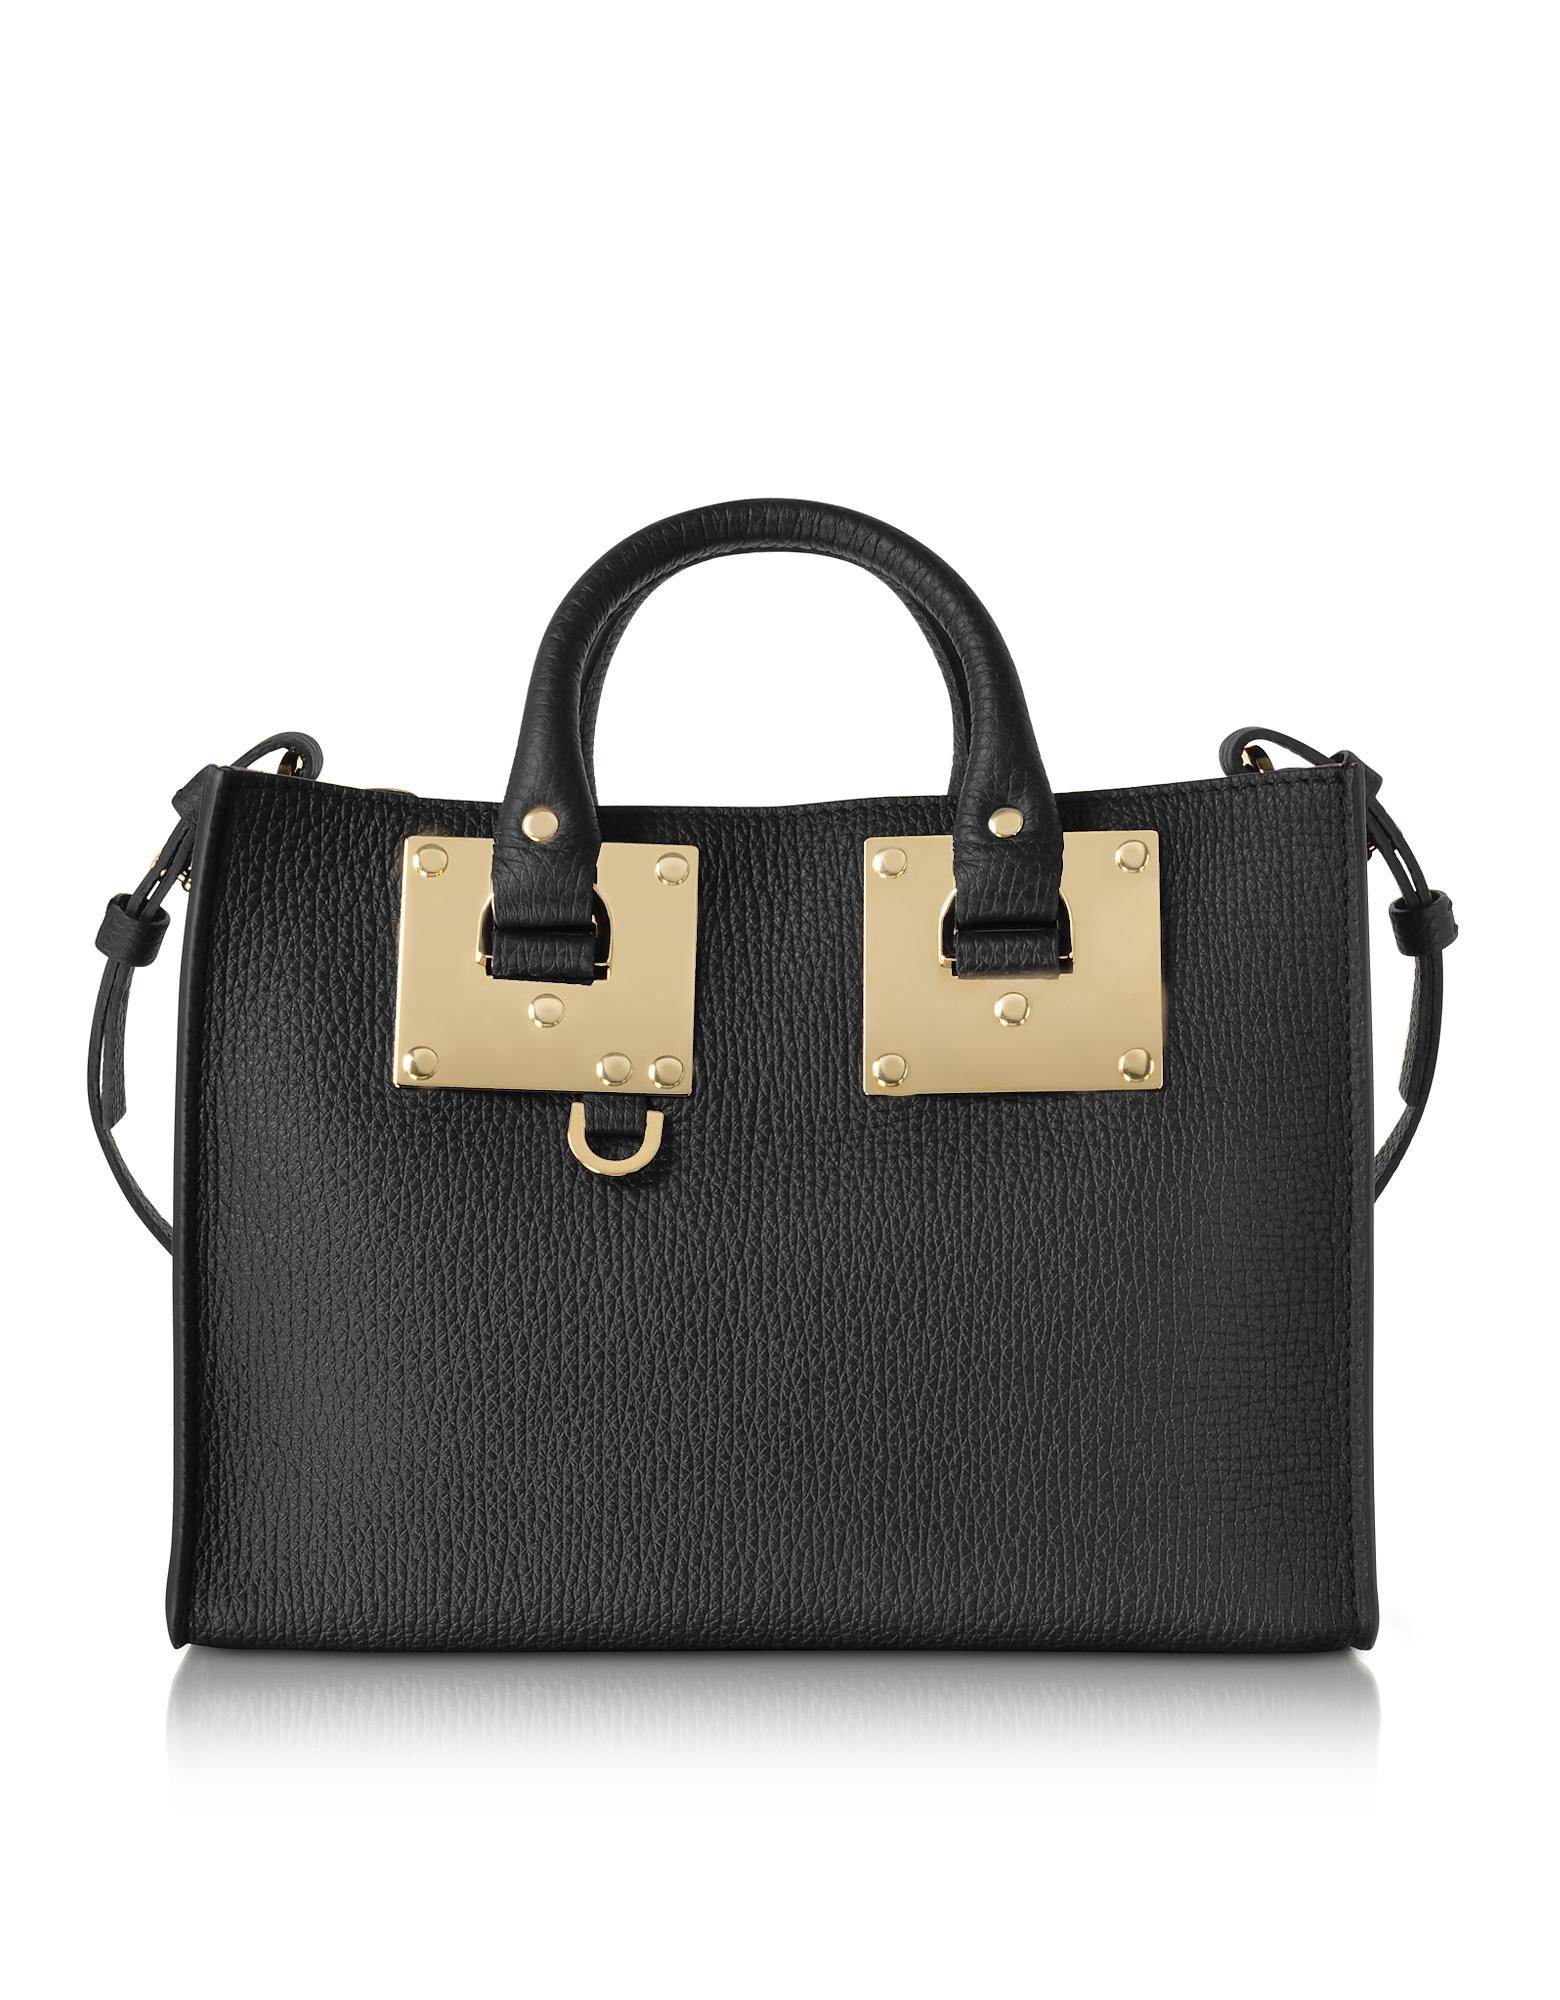 Sophie Hulme Handbags, Black Leather Small E/W Tote